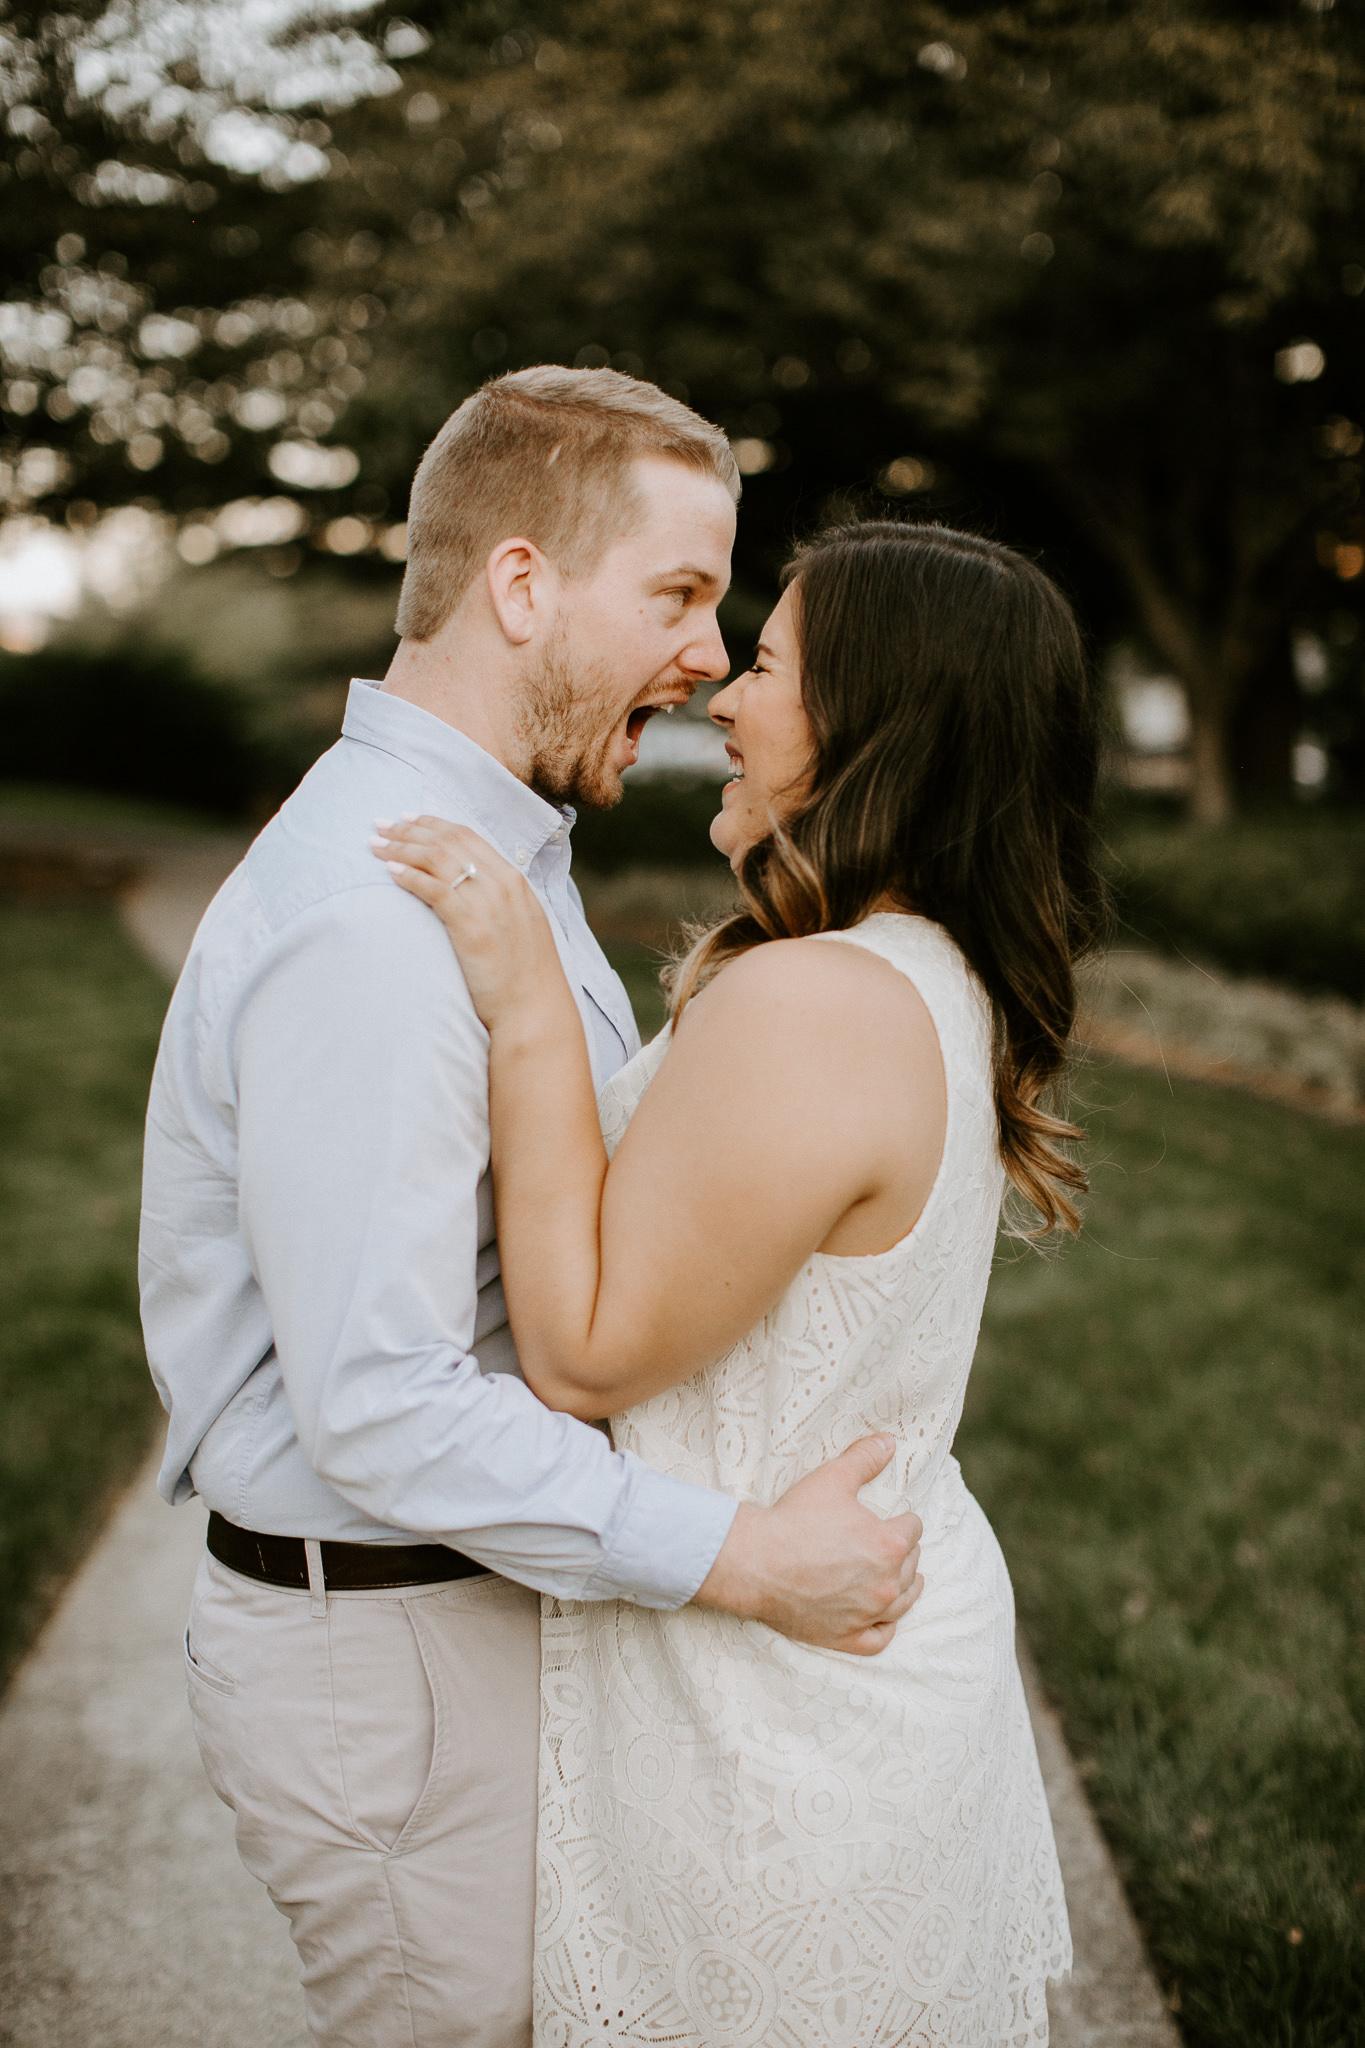 Engagement - Downtown Roanoke -  Wedding Photographer - Virginia - Best - Pat Cori Photography-28.jpg